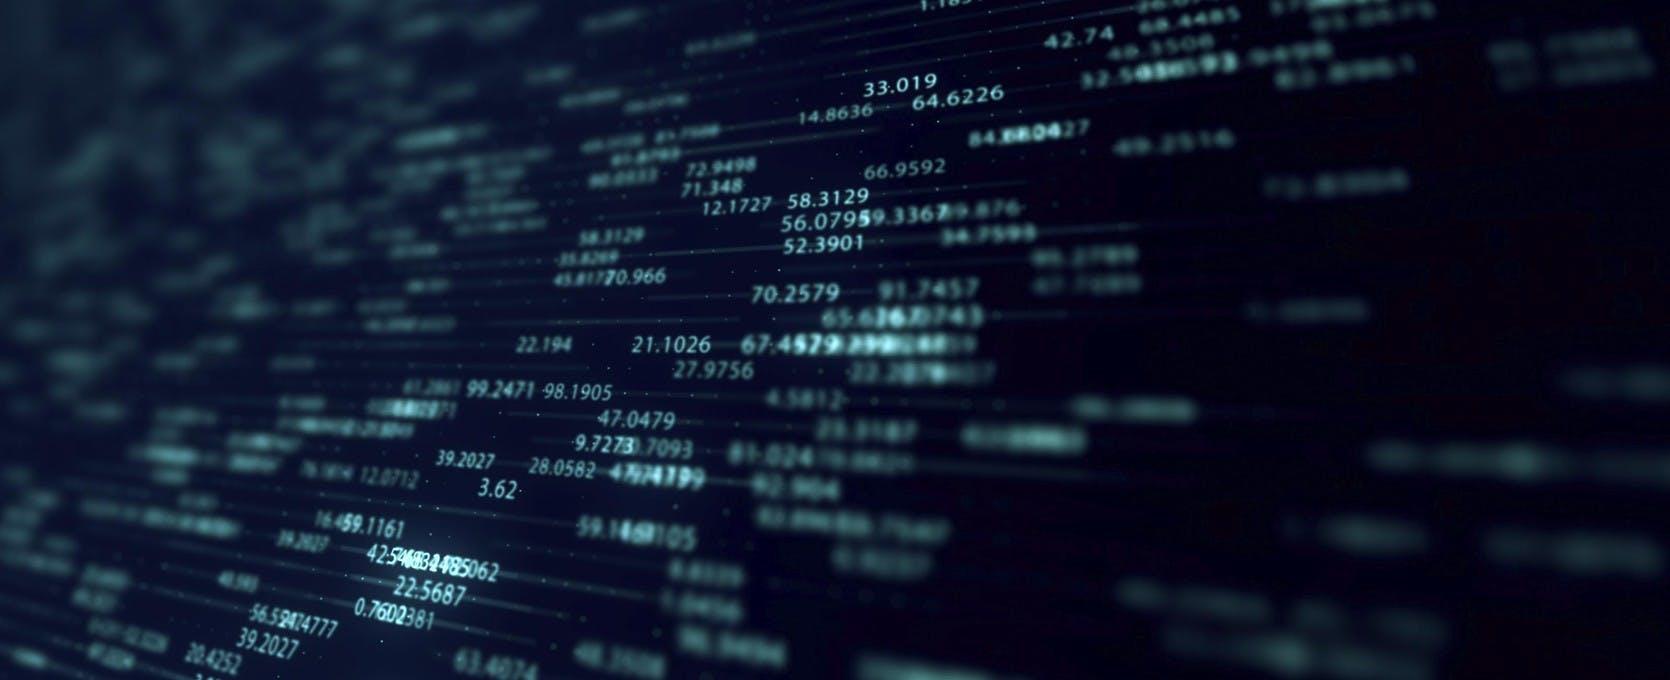 Digital values of SEC filings